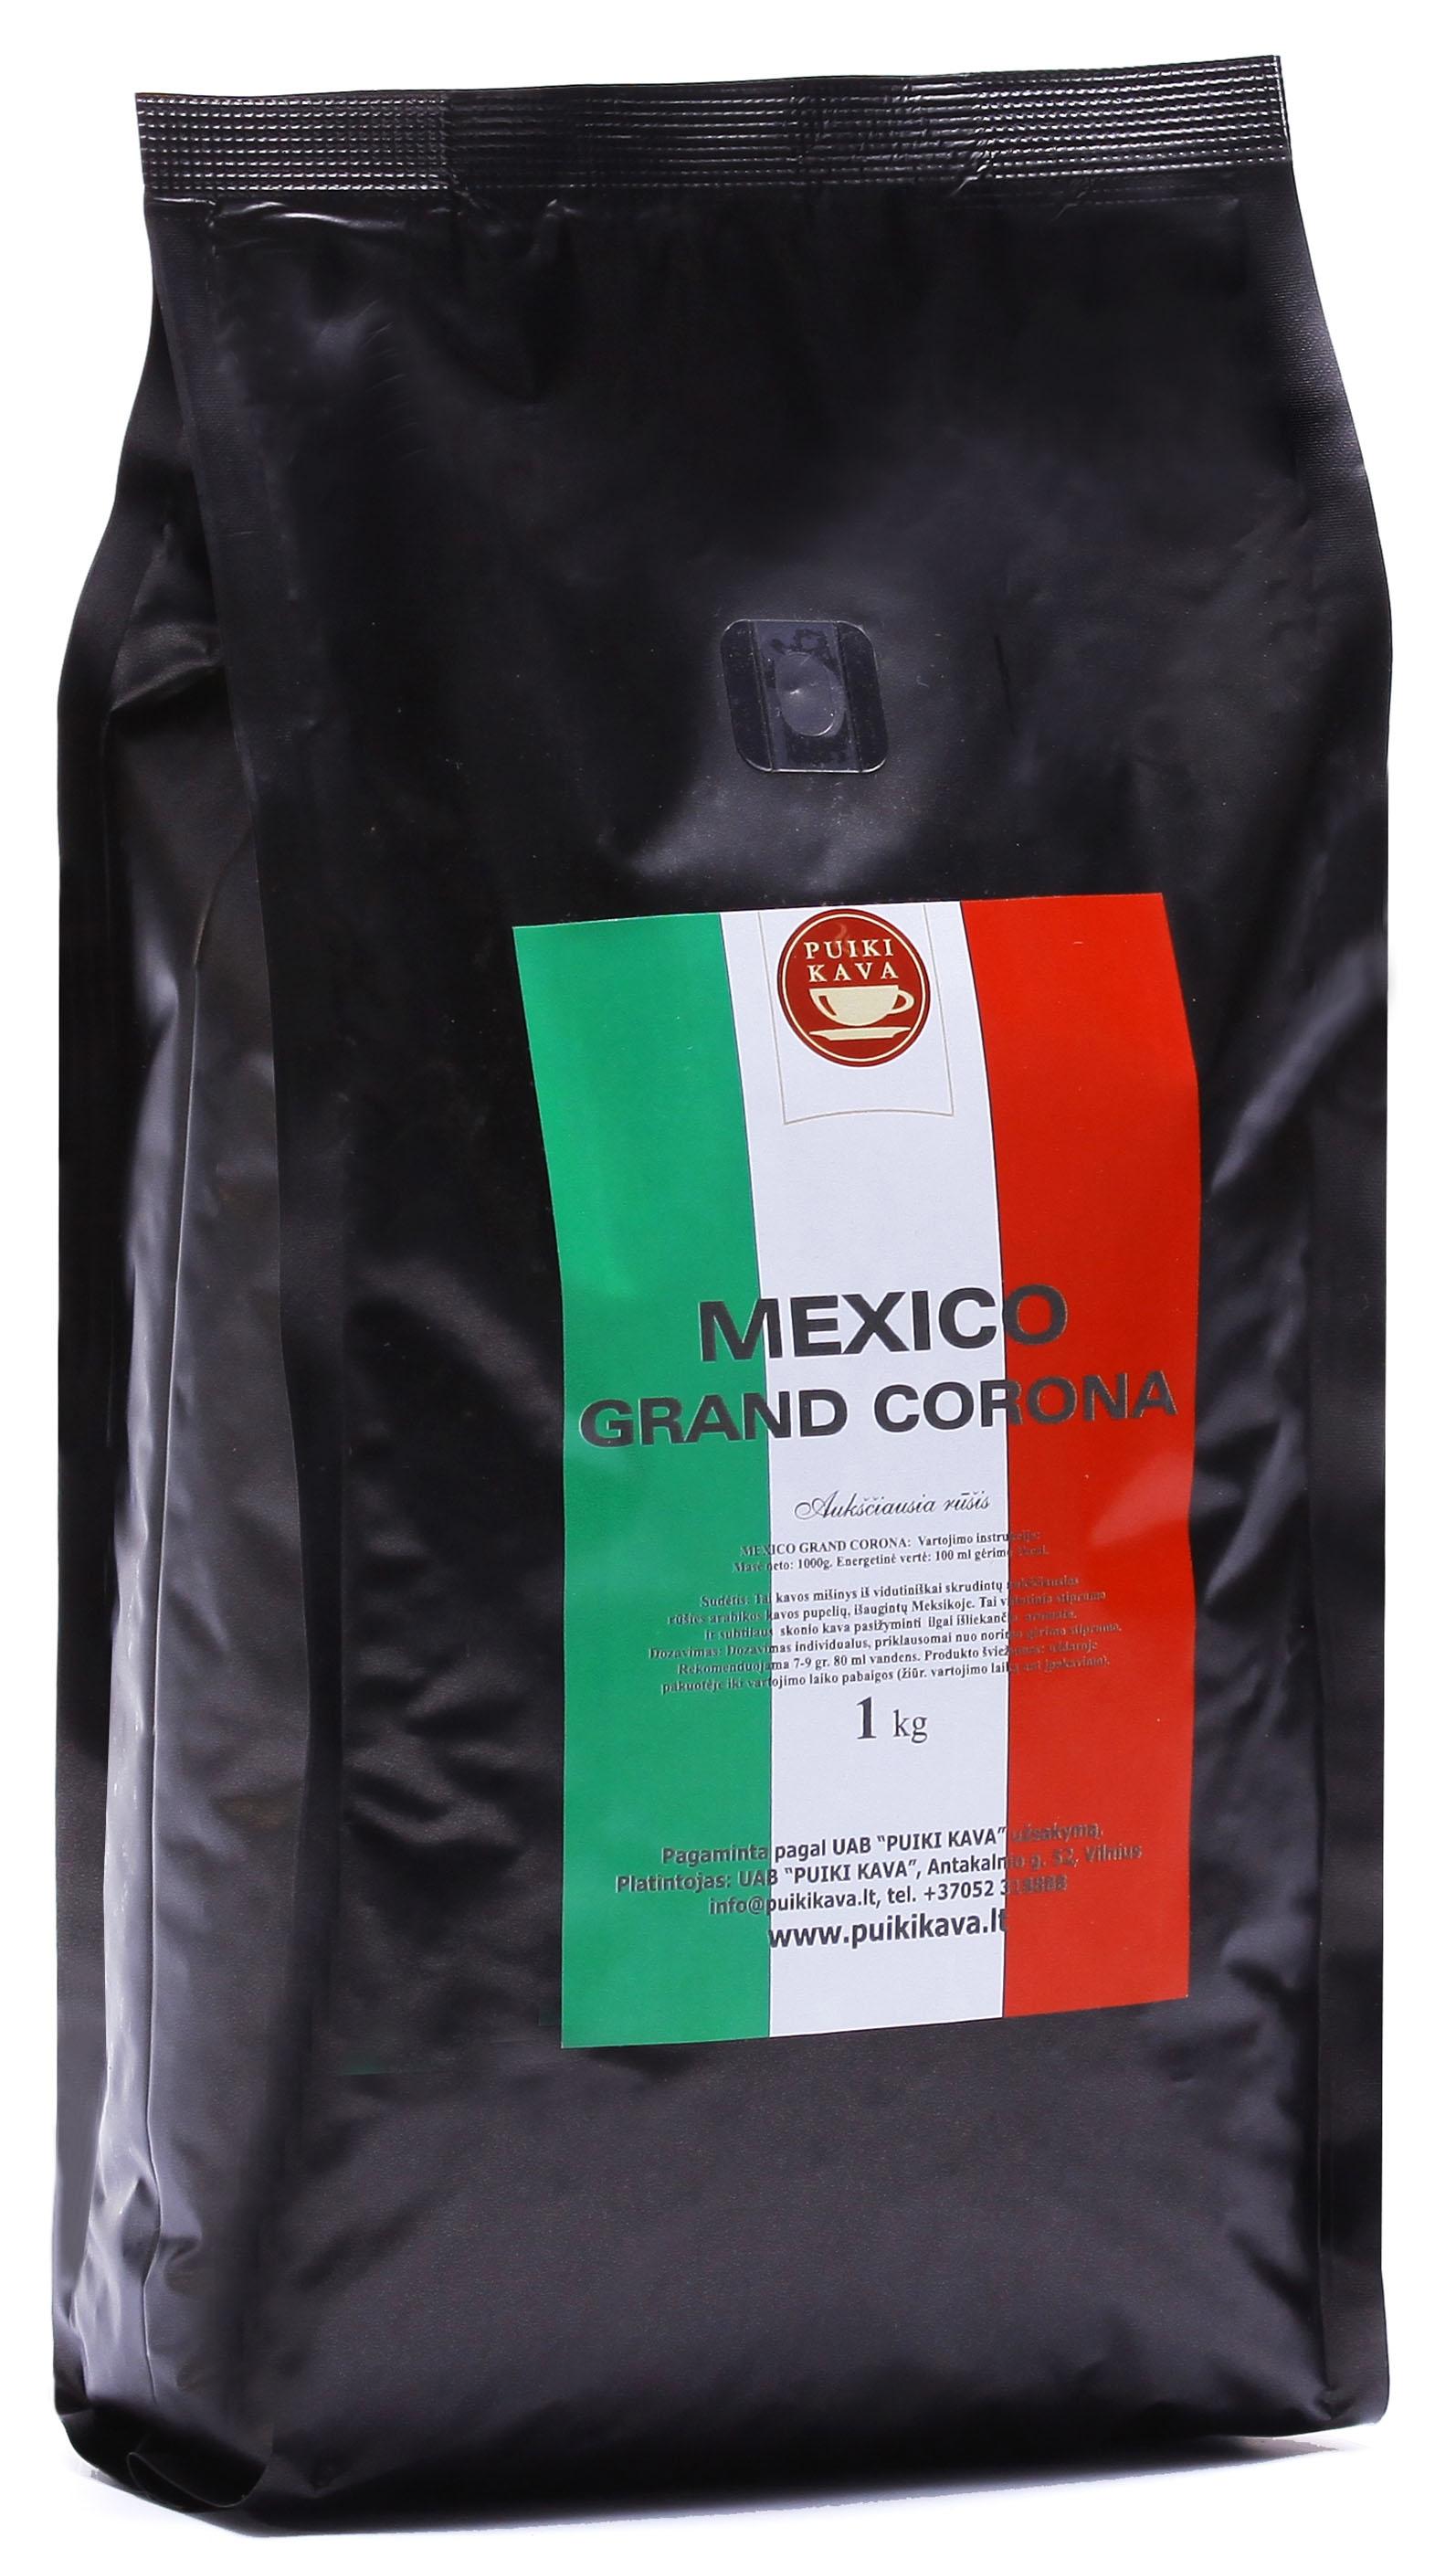 MEXICO GRAND CORONA (1kg)